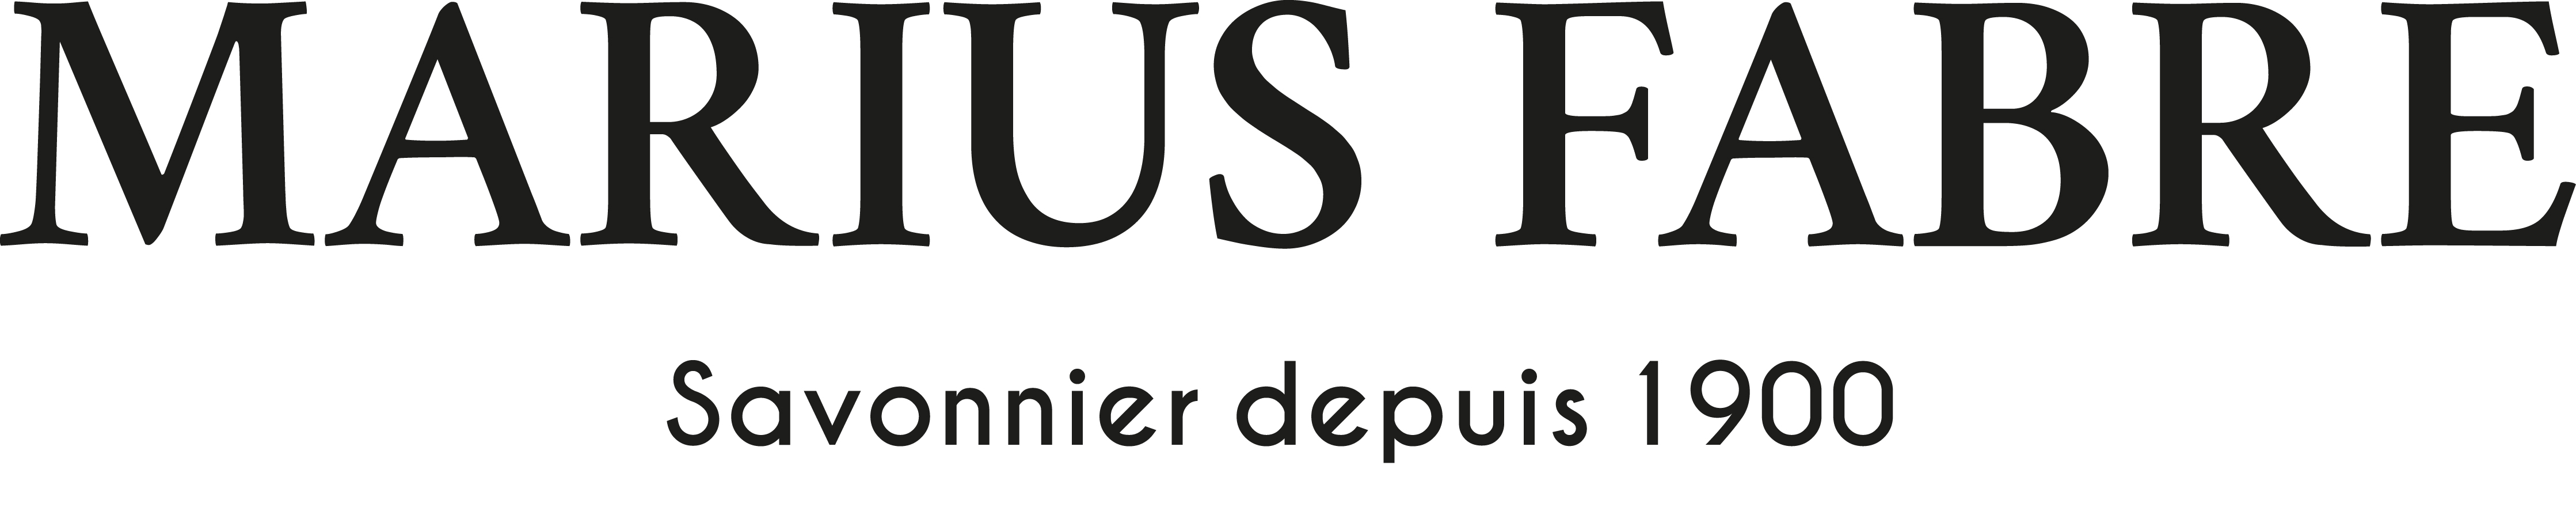 Logo mariusfabre horizontal